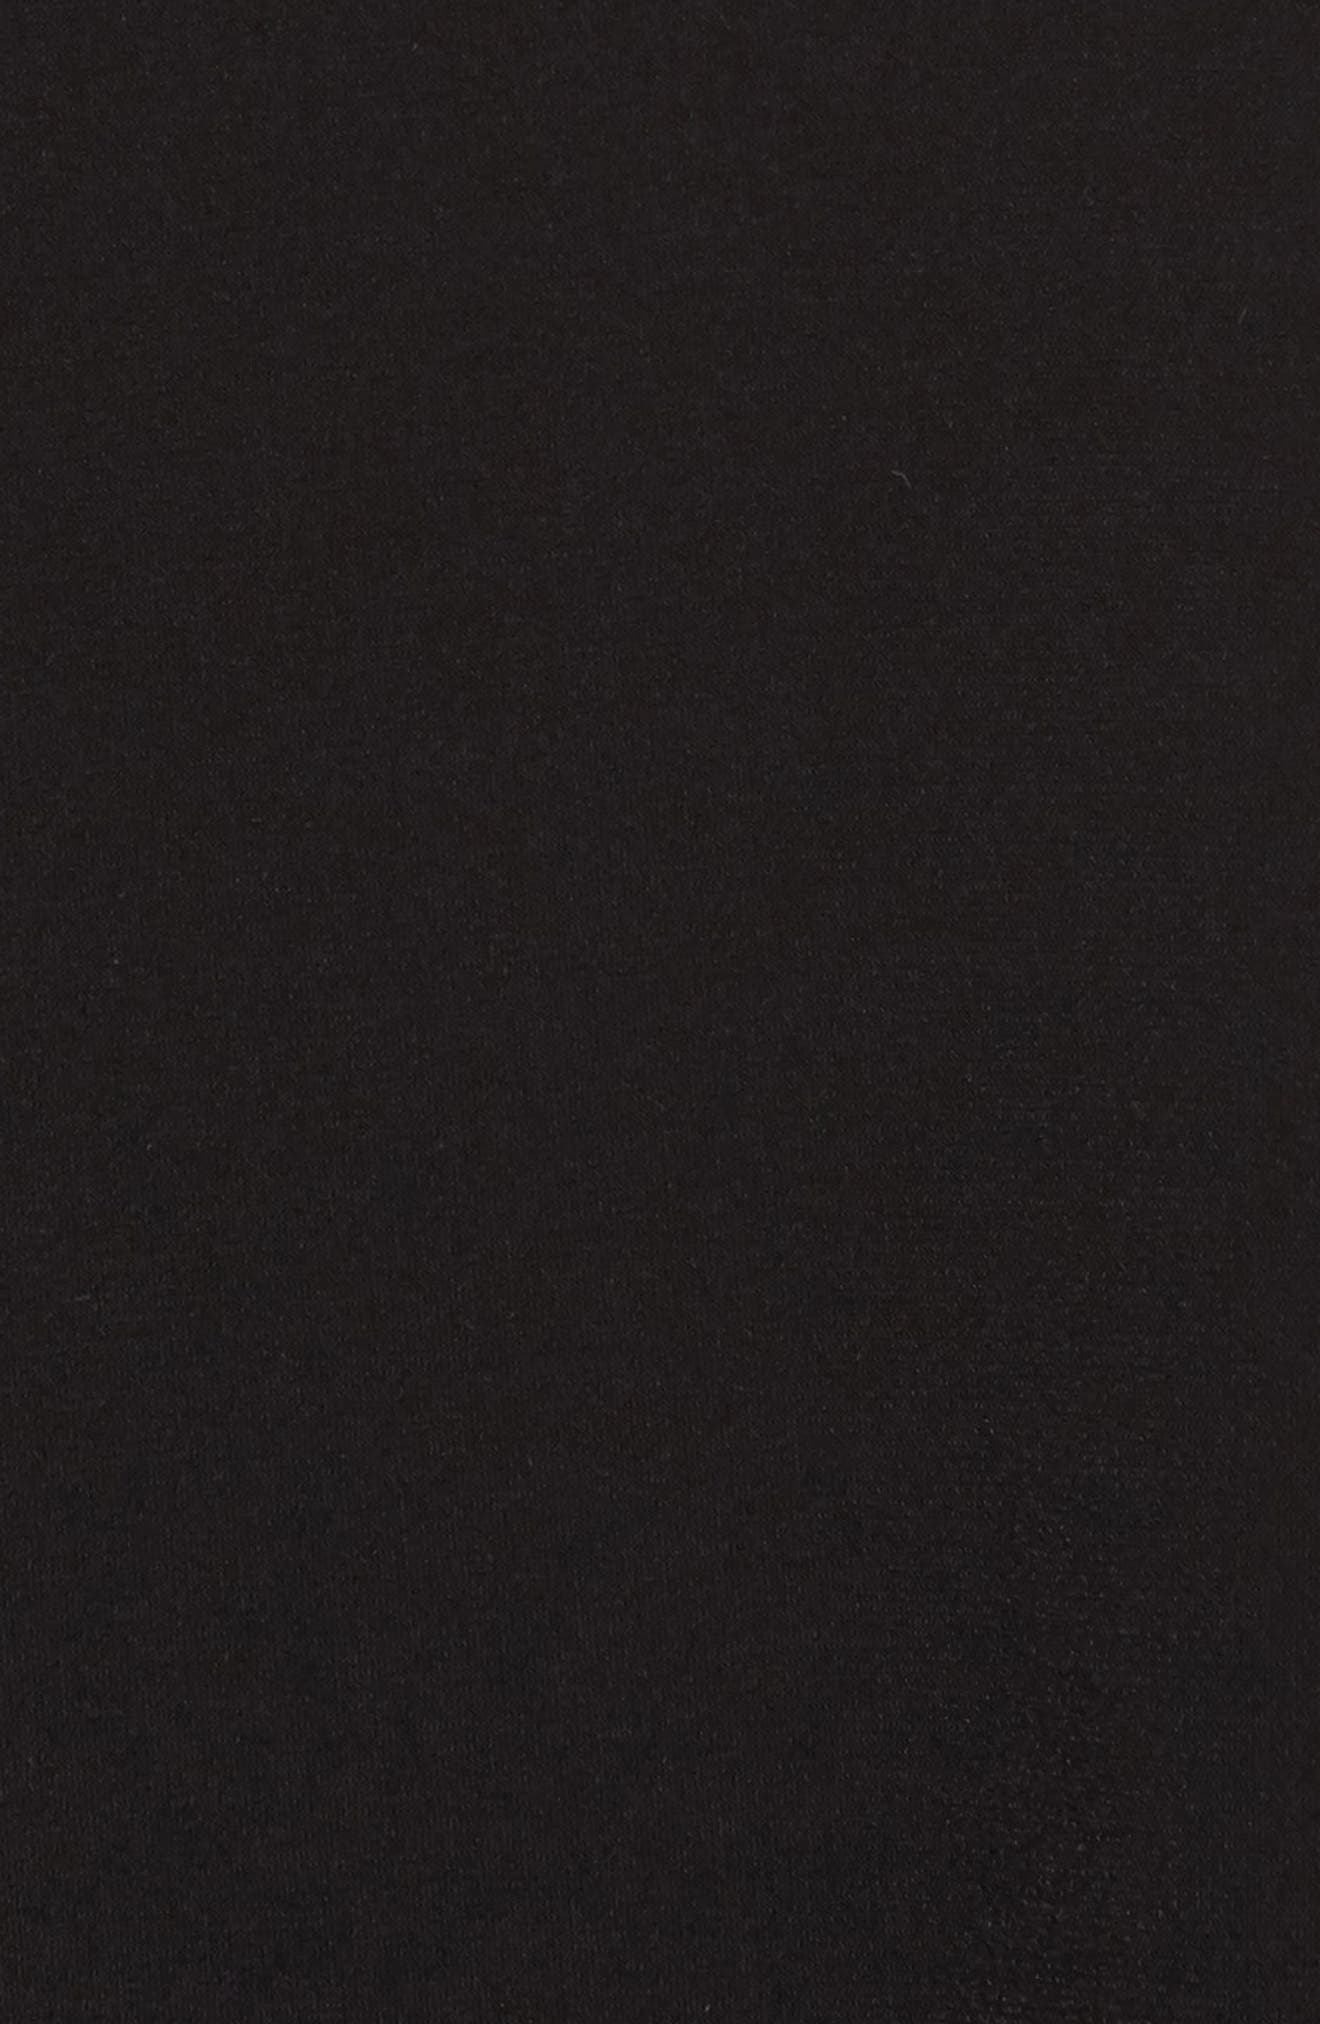 Stripe Bell Sleeve Top,                             Alternate thumbnail 6, color,                             001